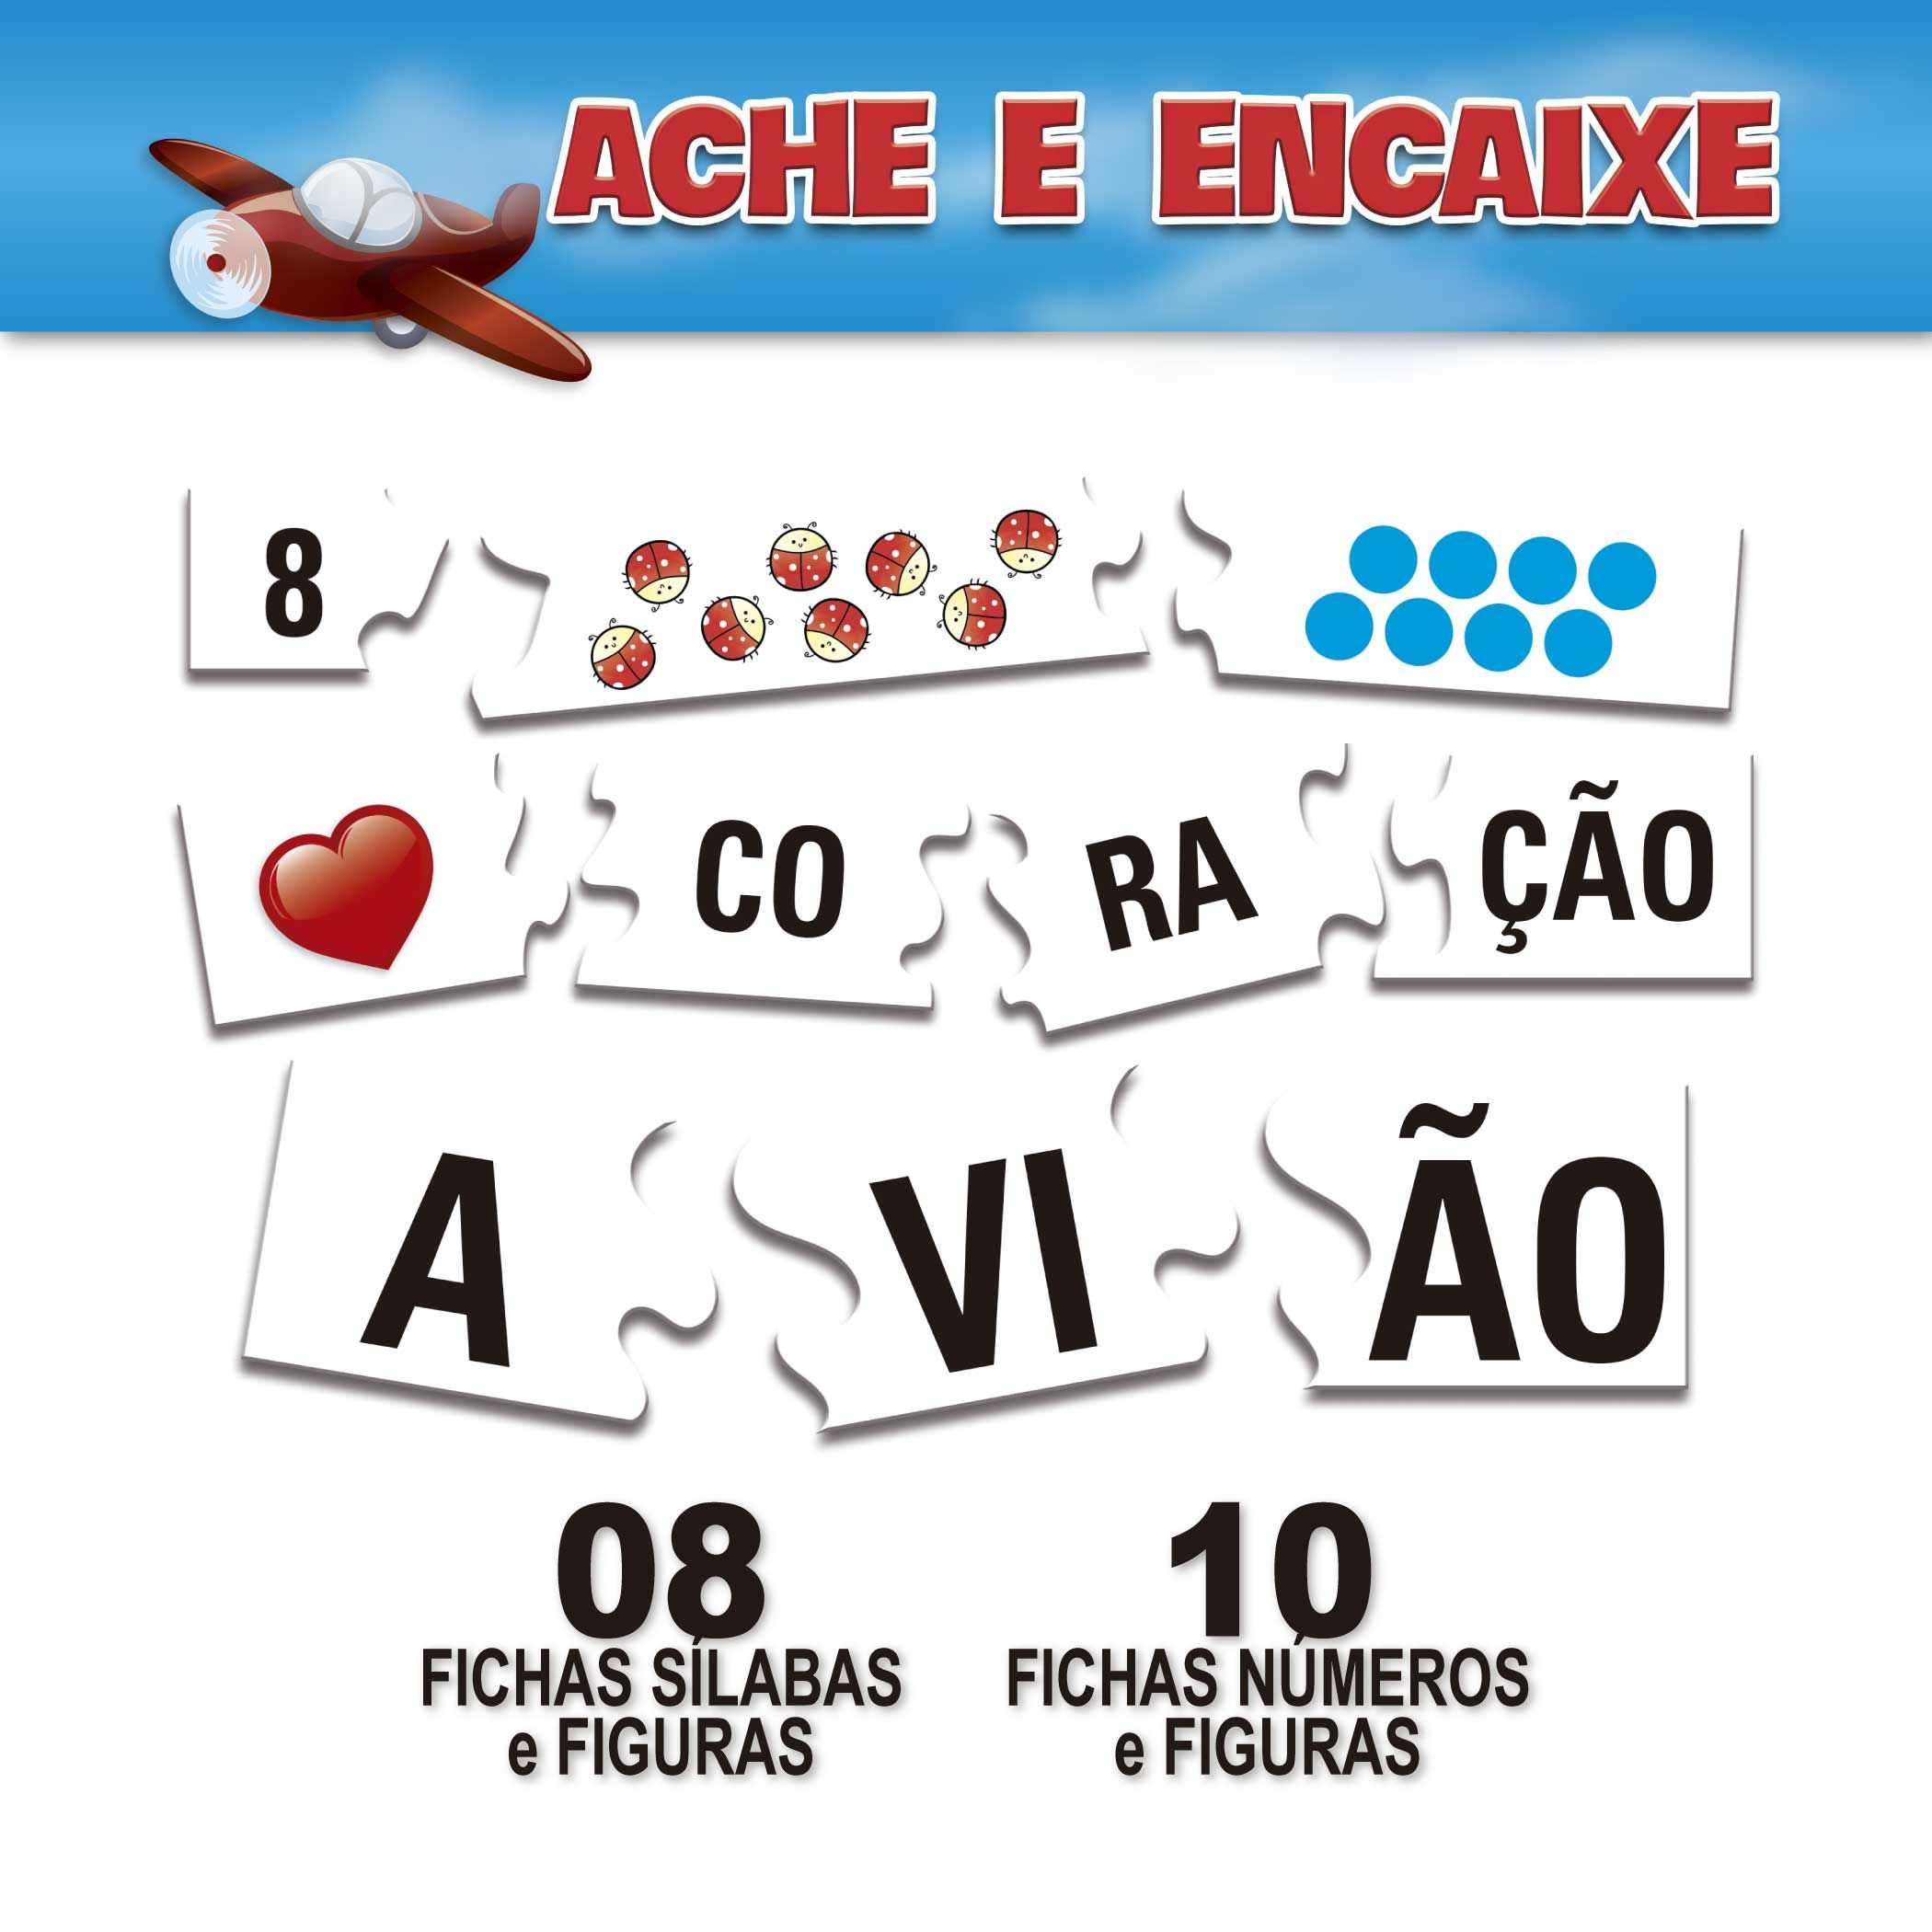 https://www.paisefilhos.ind.br/uploads/31f498cfb3aa9bce527c8b42dd55846b.jpg